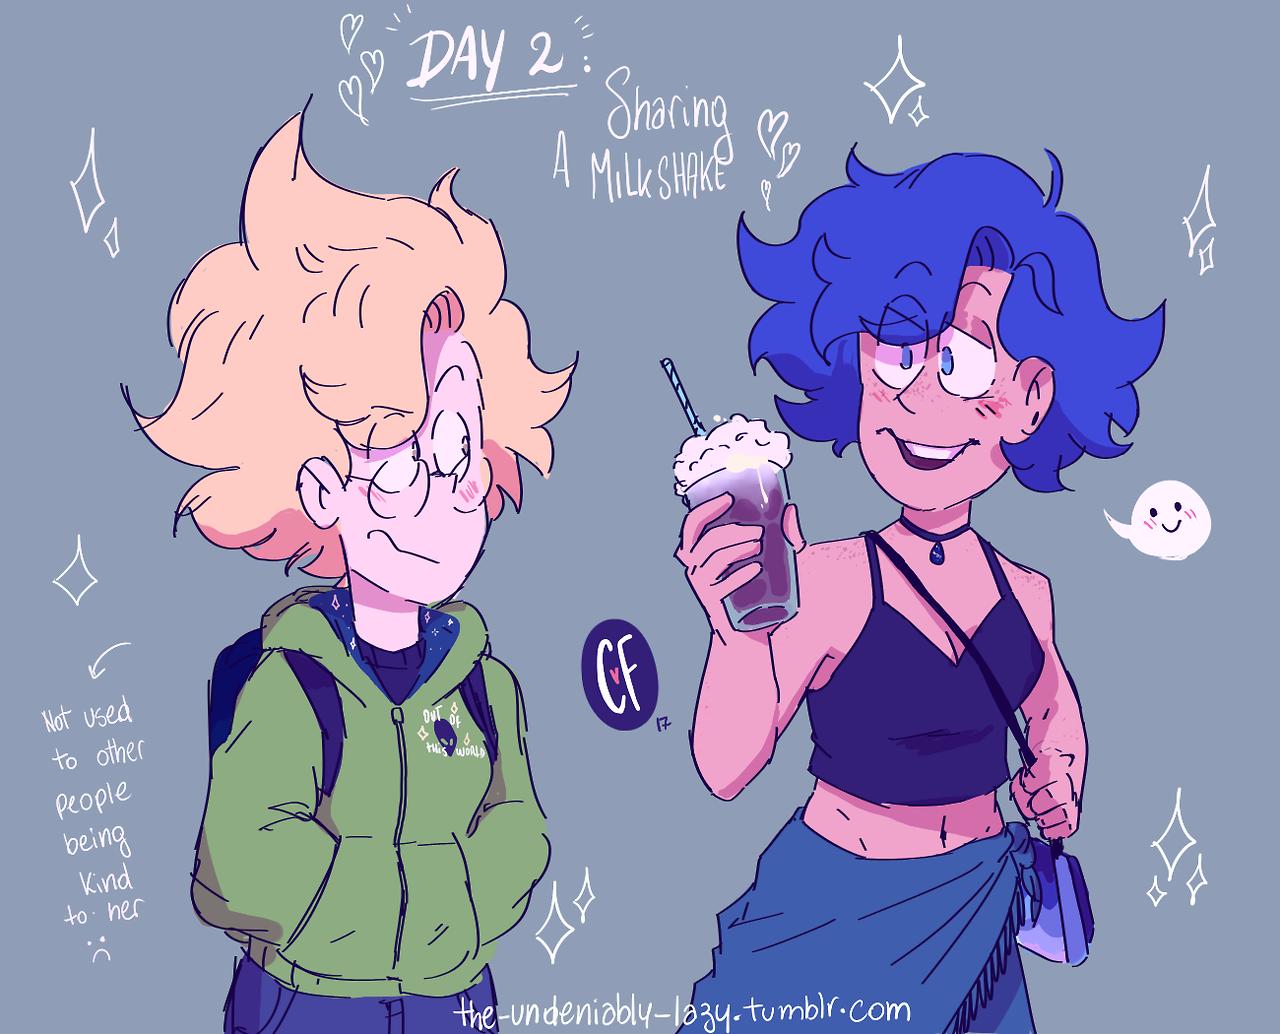 Day 2: Sharing a milkshake ✨✨✨💖